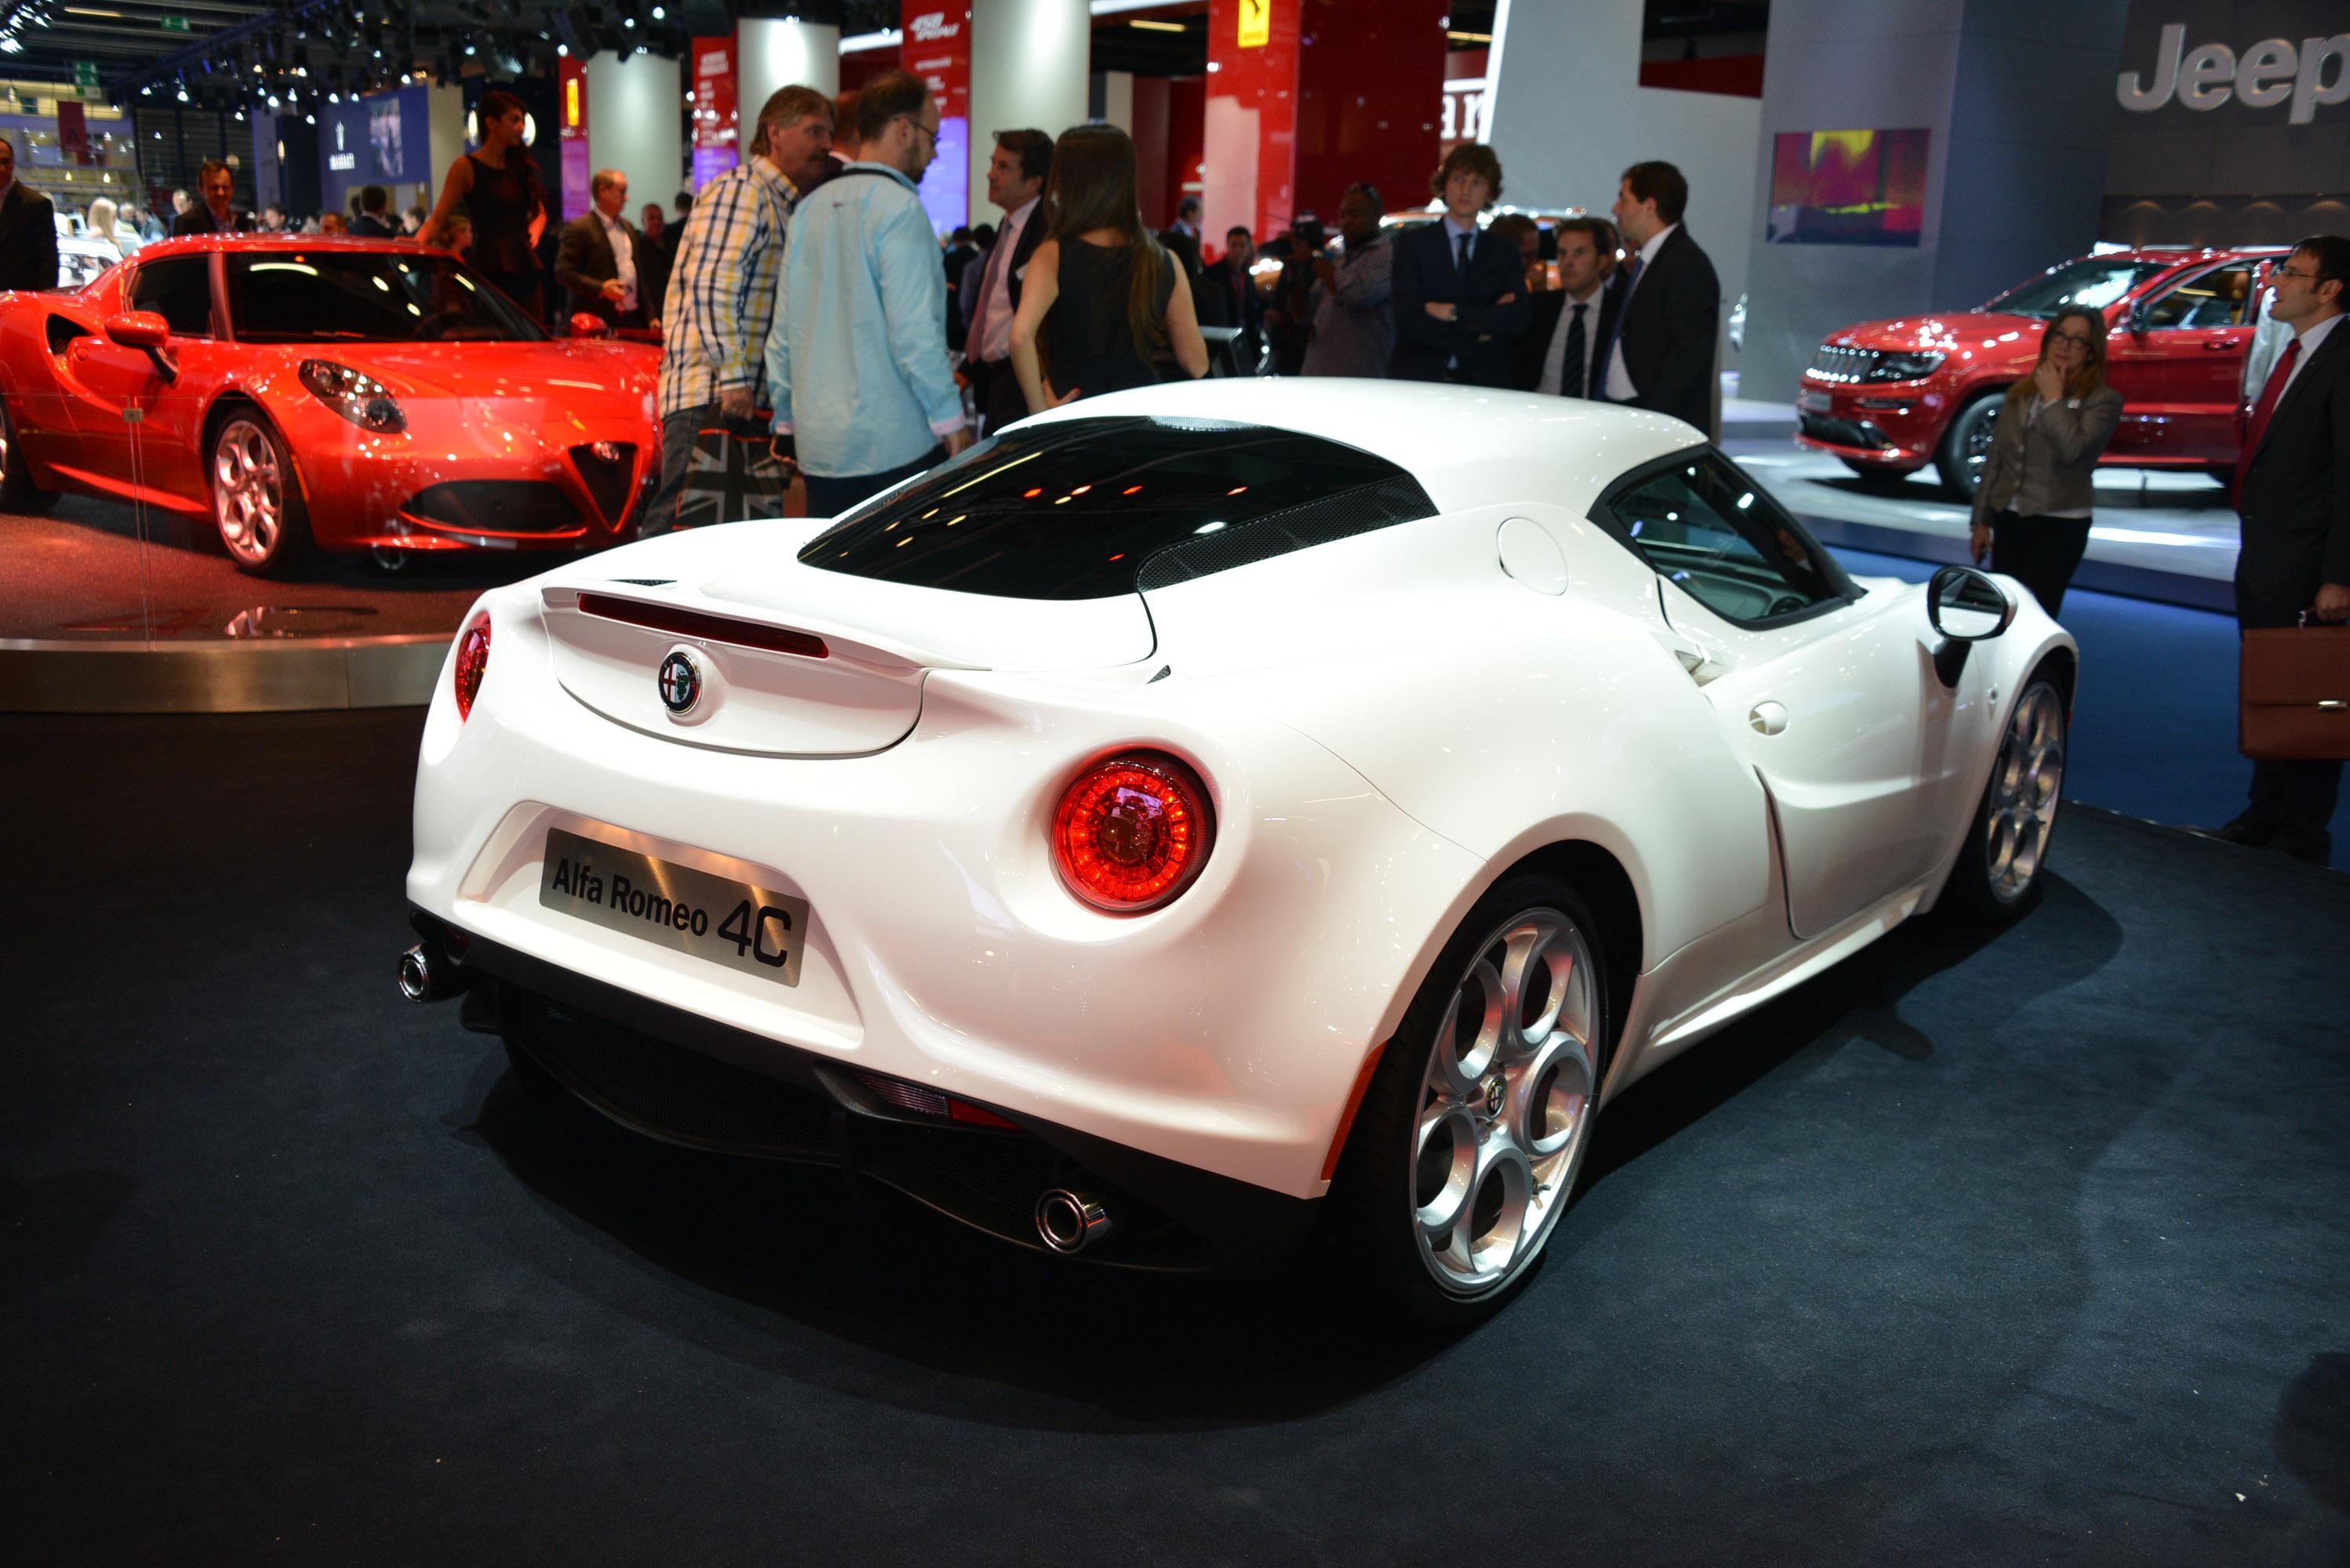 Alfa Romeo 4C Most Beautiful Car of the Year 2013 Says Internet Survey